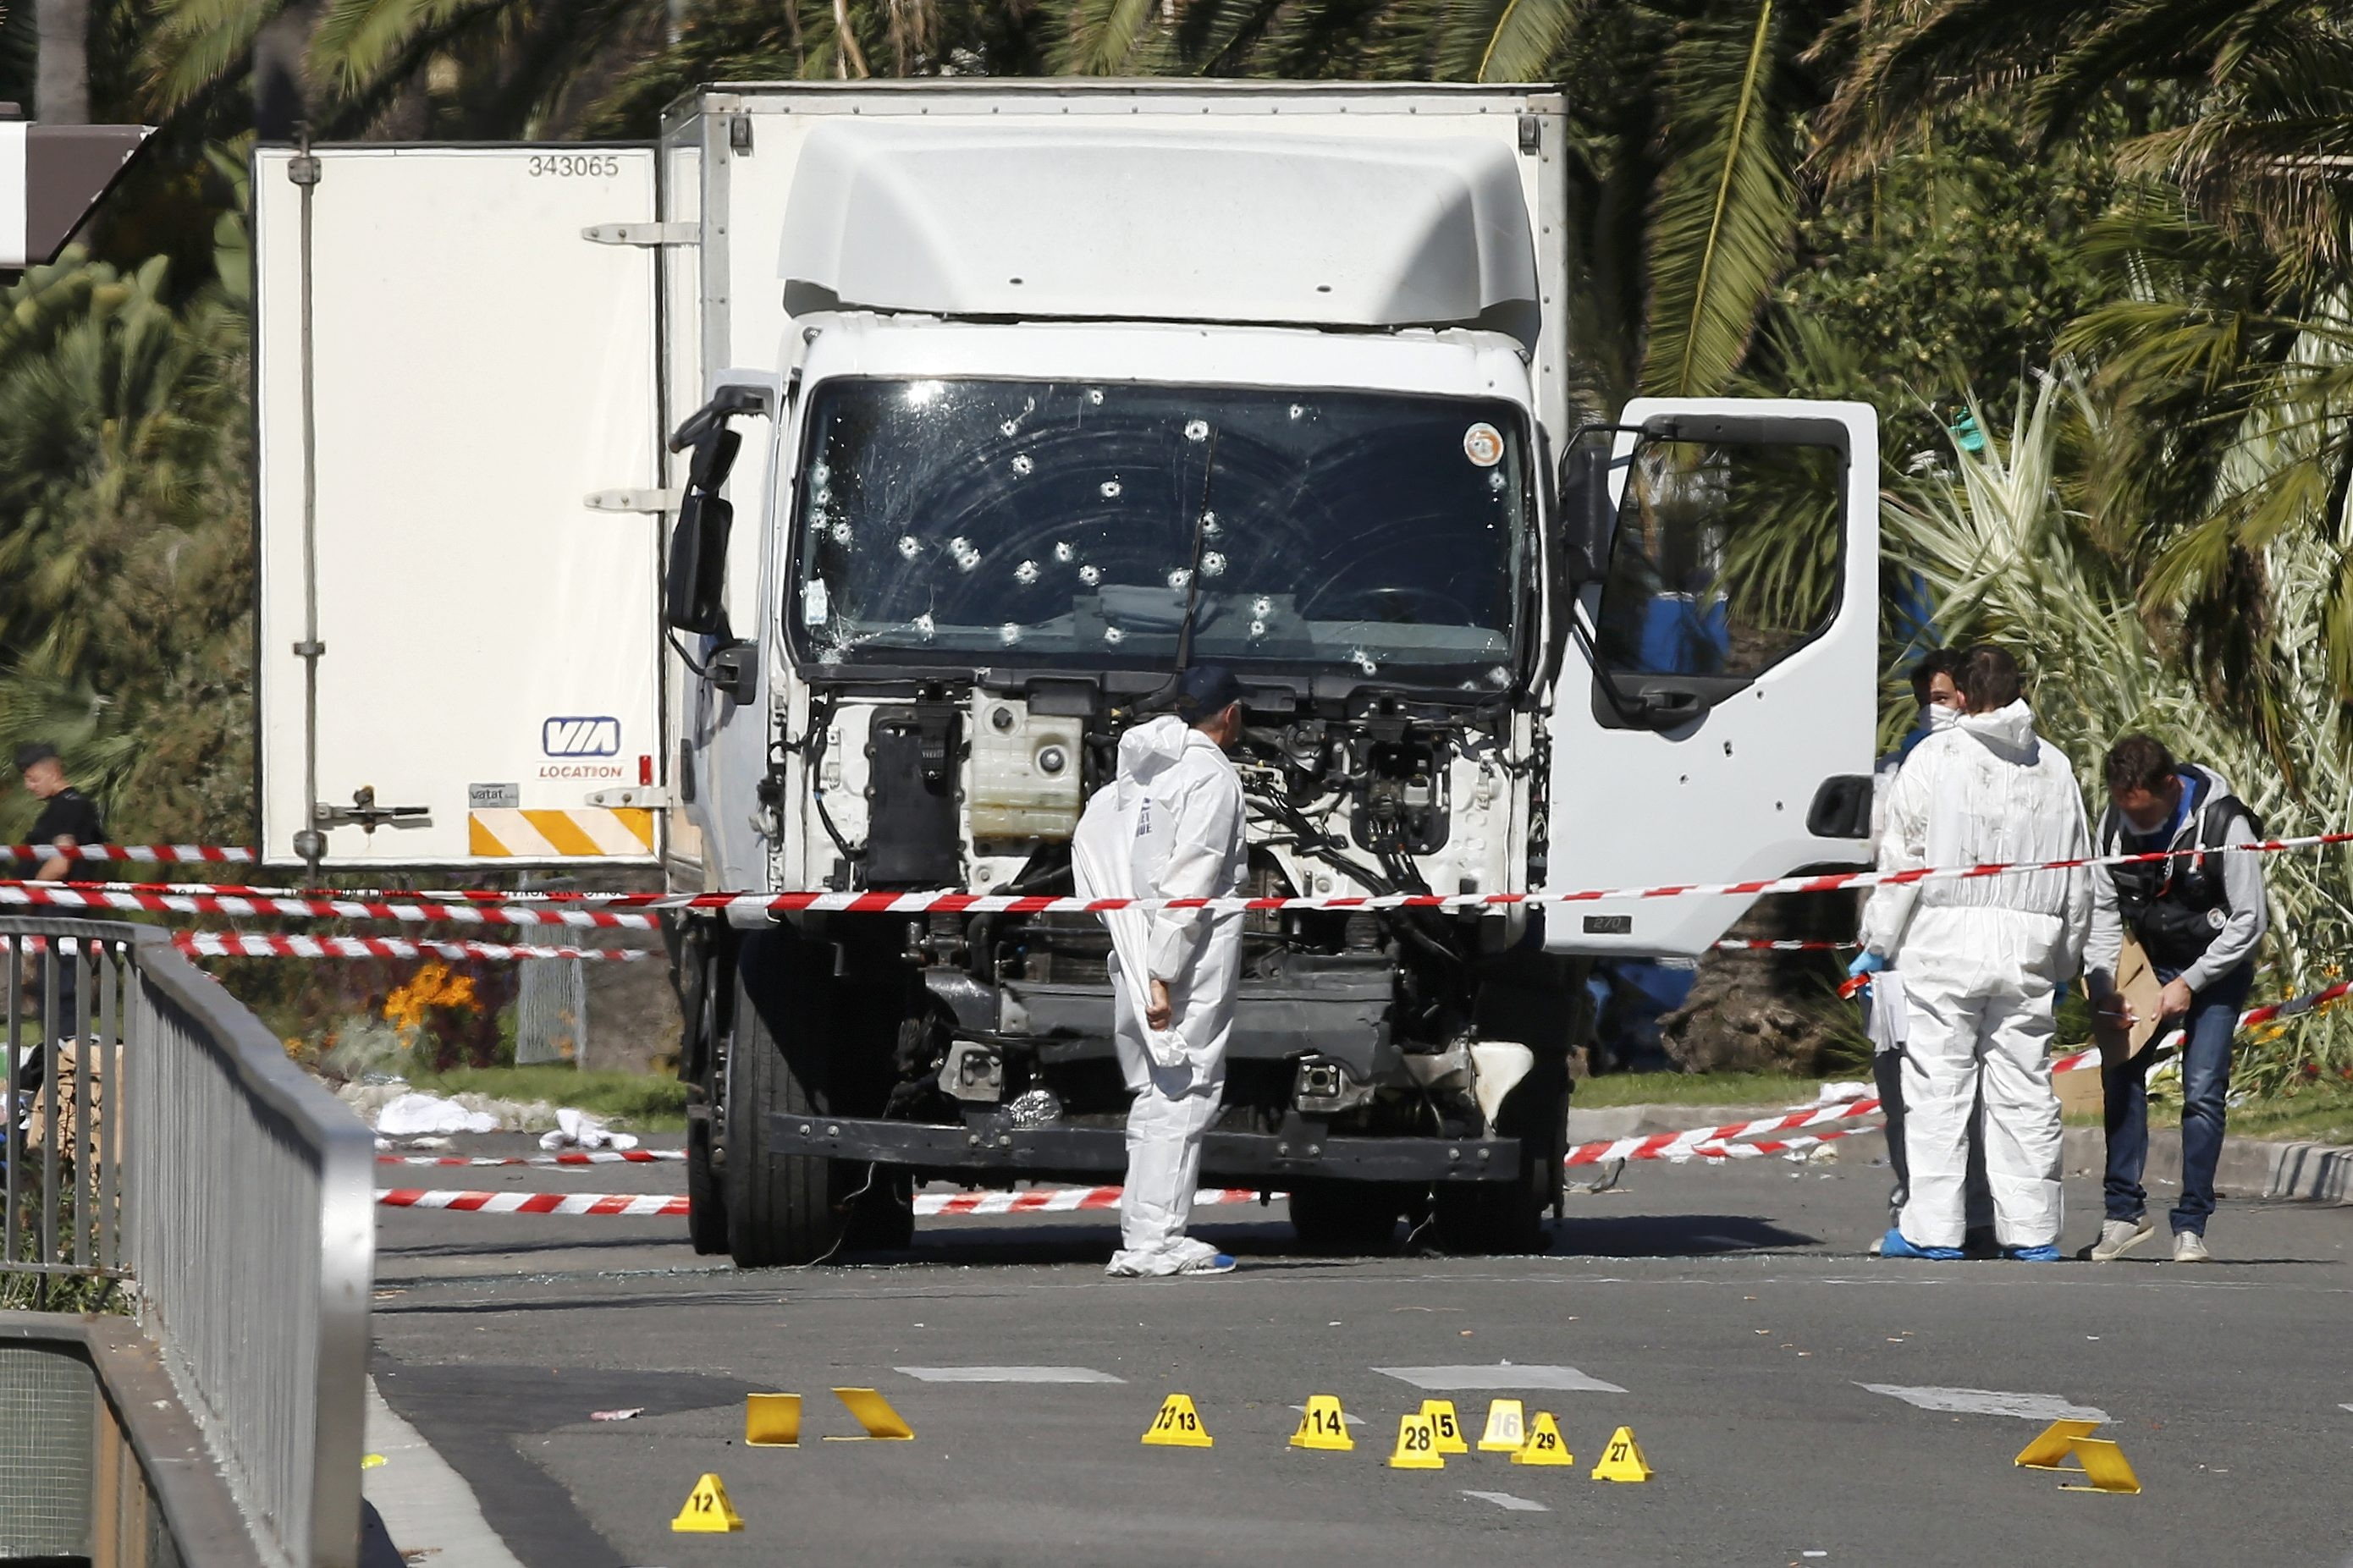 <p>Грузовик, на котором Мохаммед Бухлель совершил акт террора в Ницце. Фото: &copy;&nbsp;<span>REUTERS/Eric Gaillard</span></p>